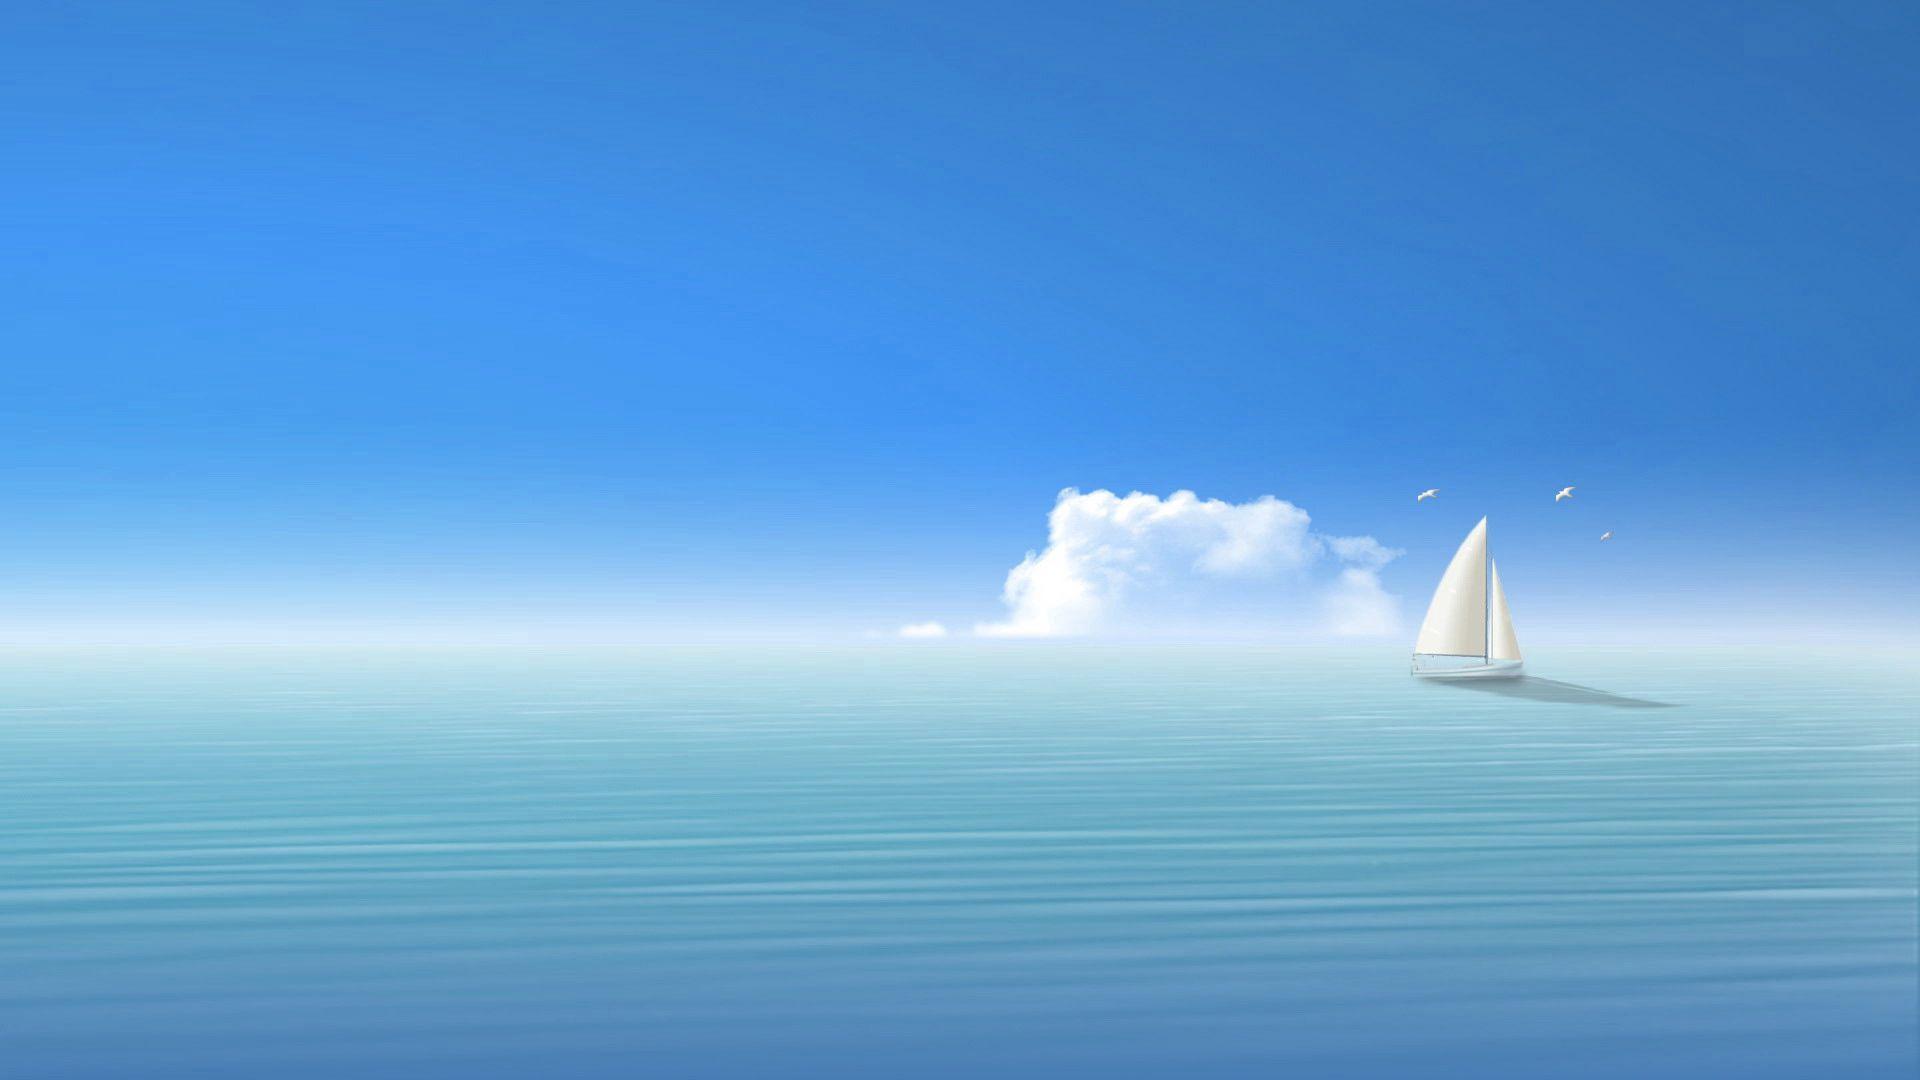 blue_sea_ship_sky_248_1920x1080